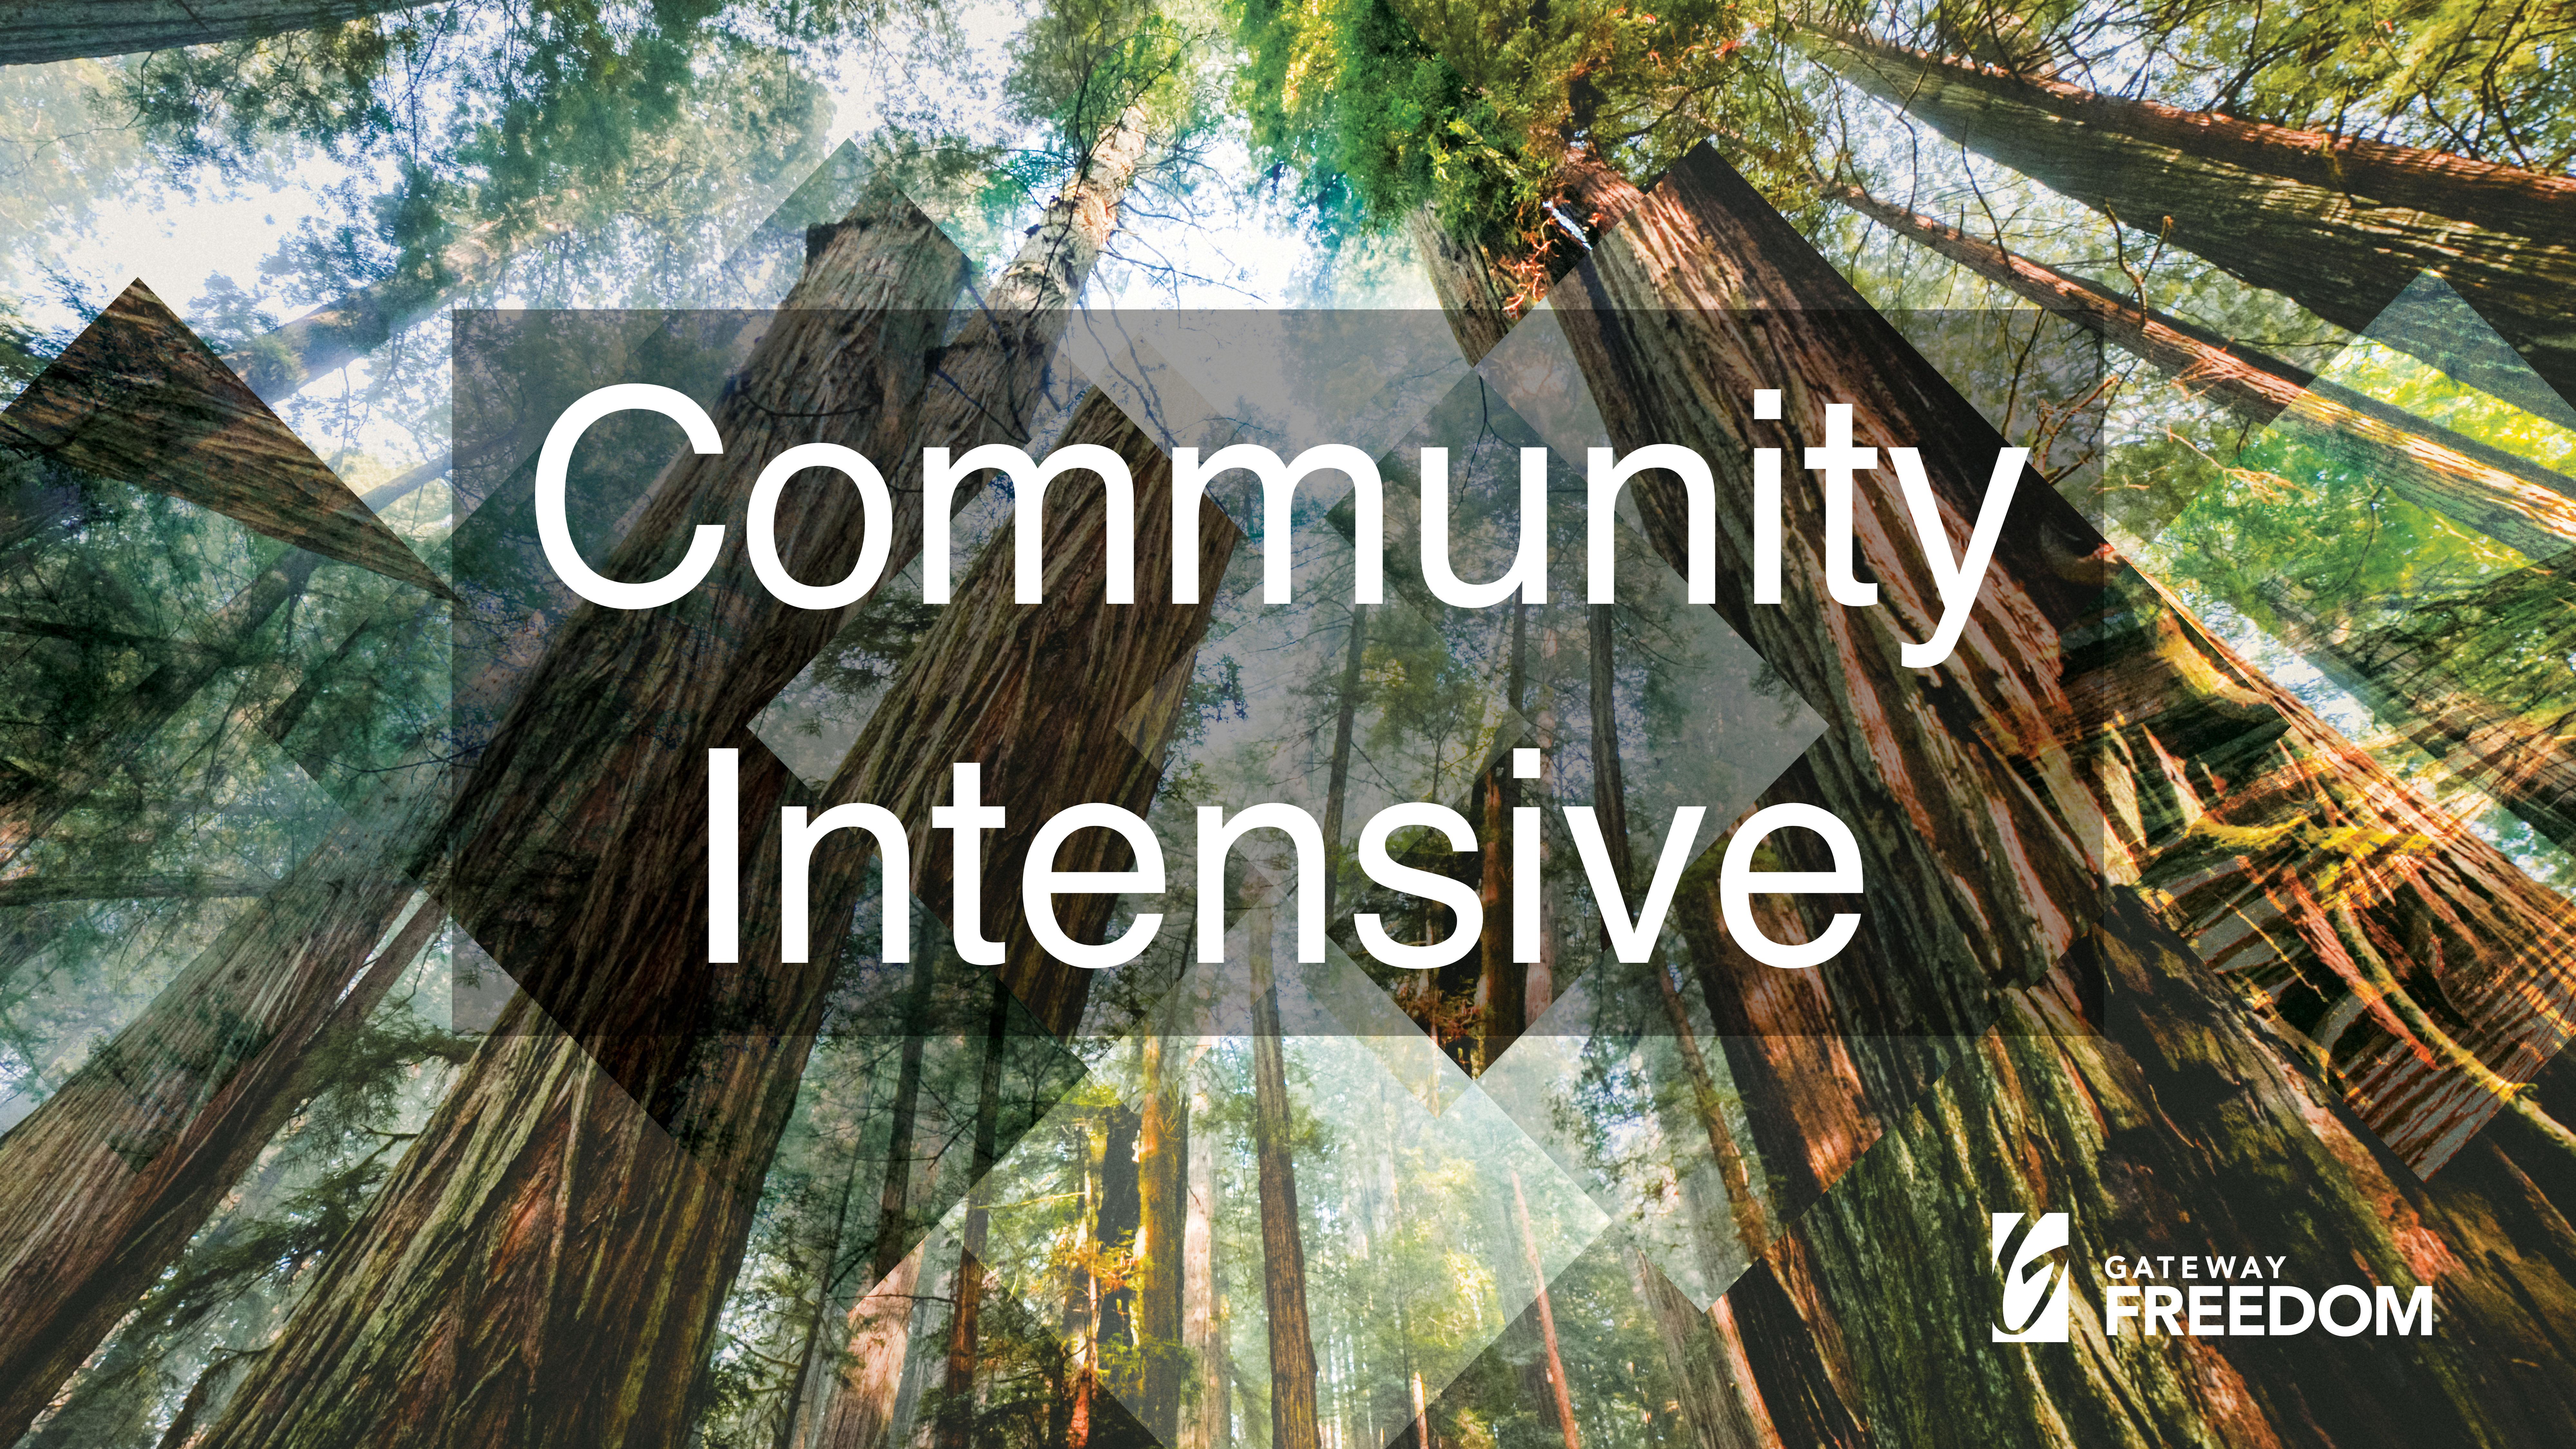 Communityintensives